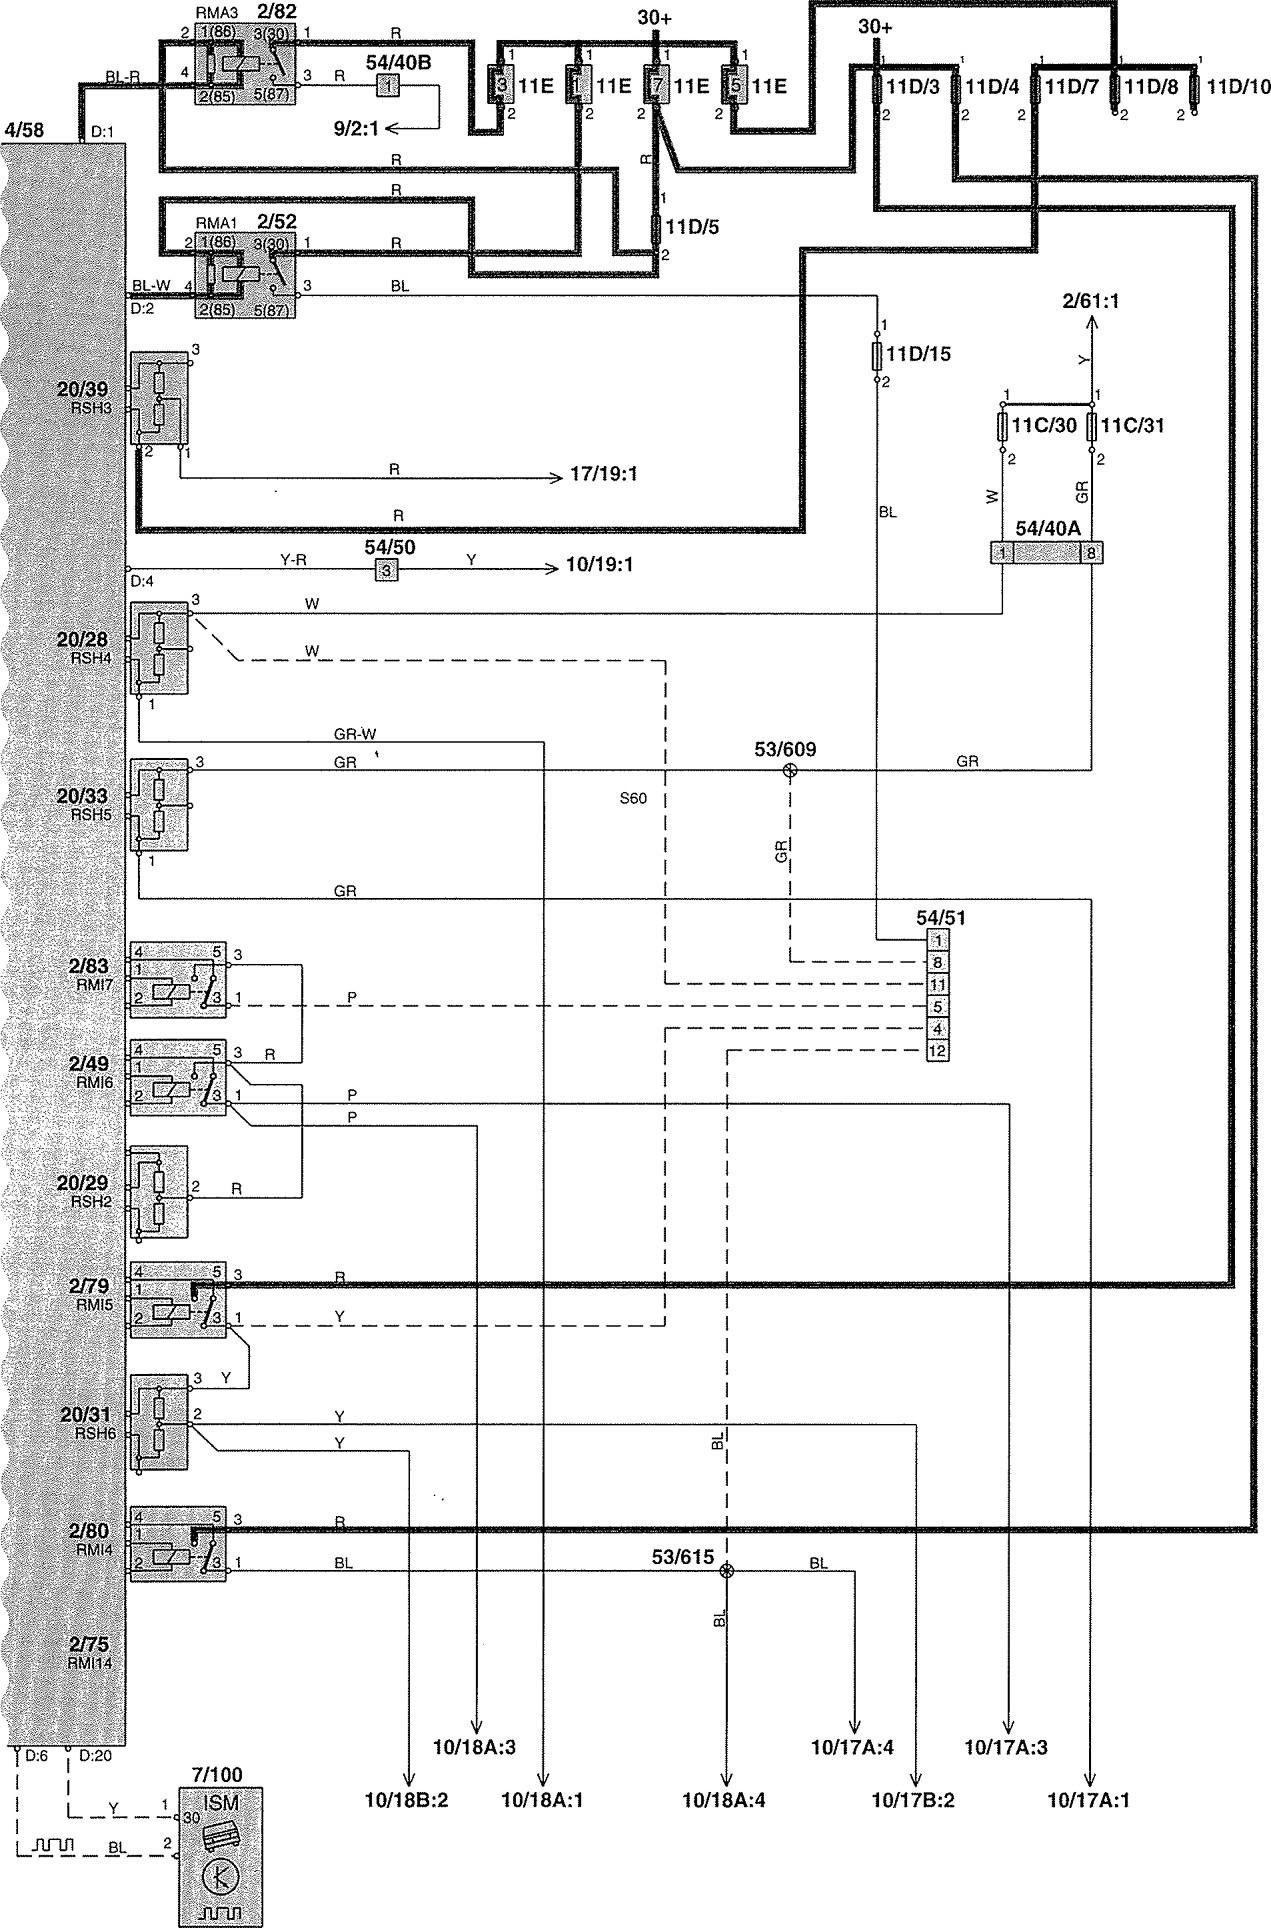 wiring diagram volvo p1800 volvo v70 electrical diagram wire diagrams rh maerkang org